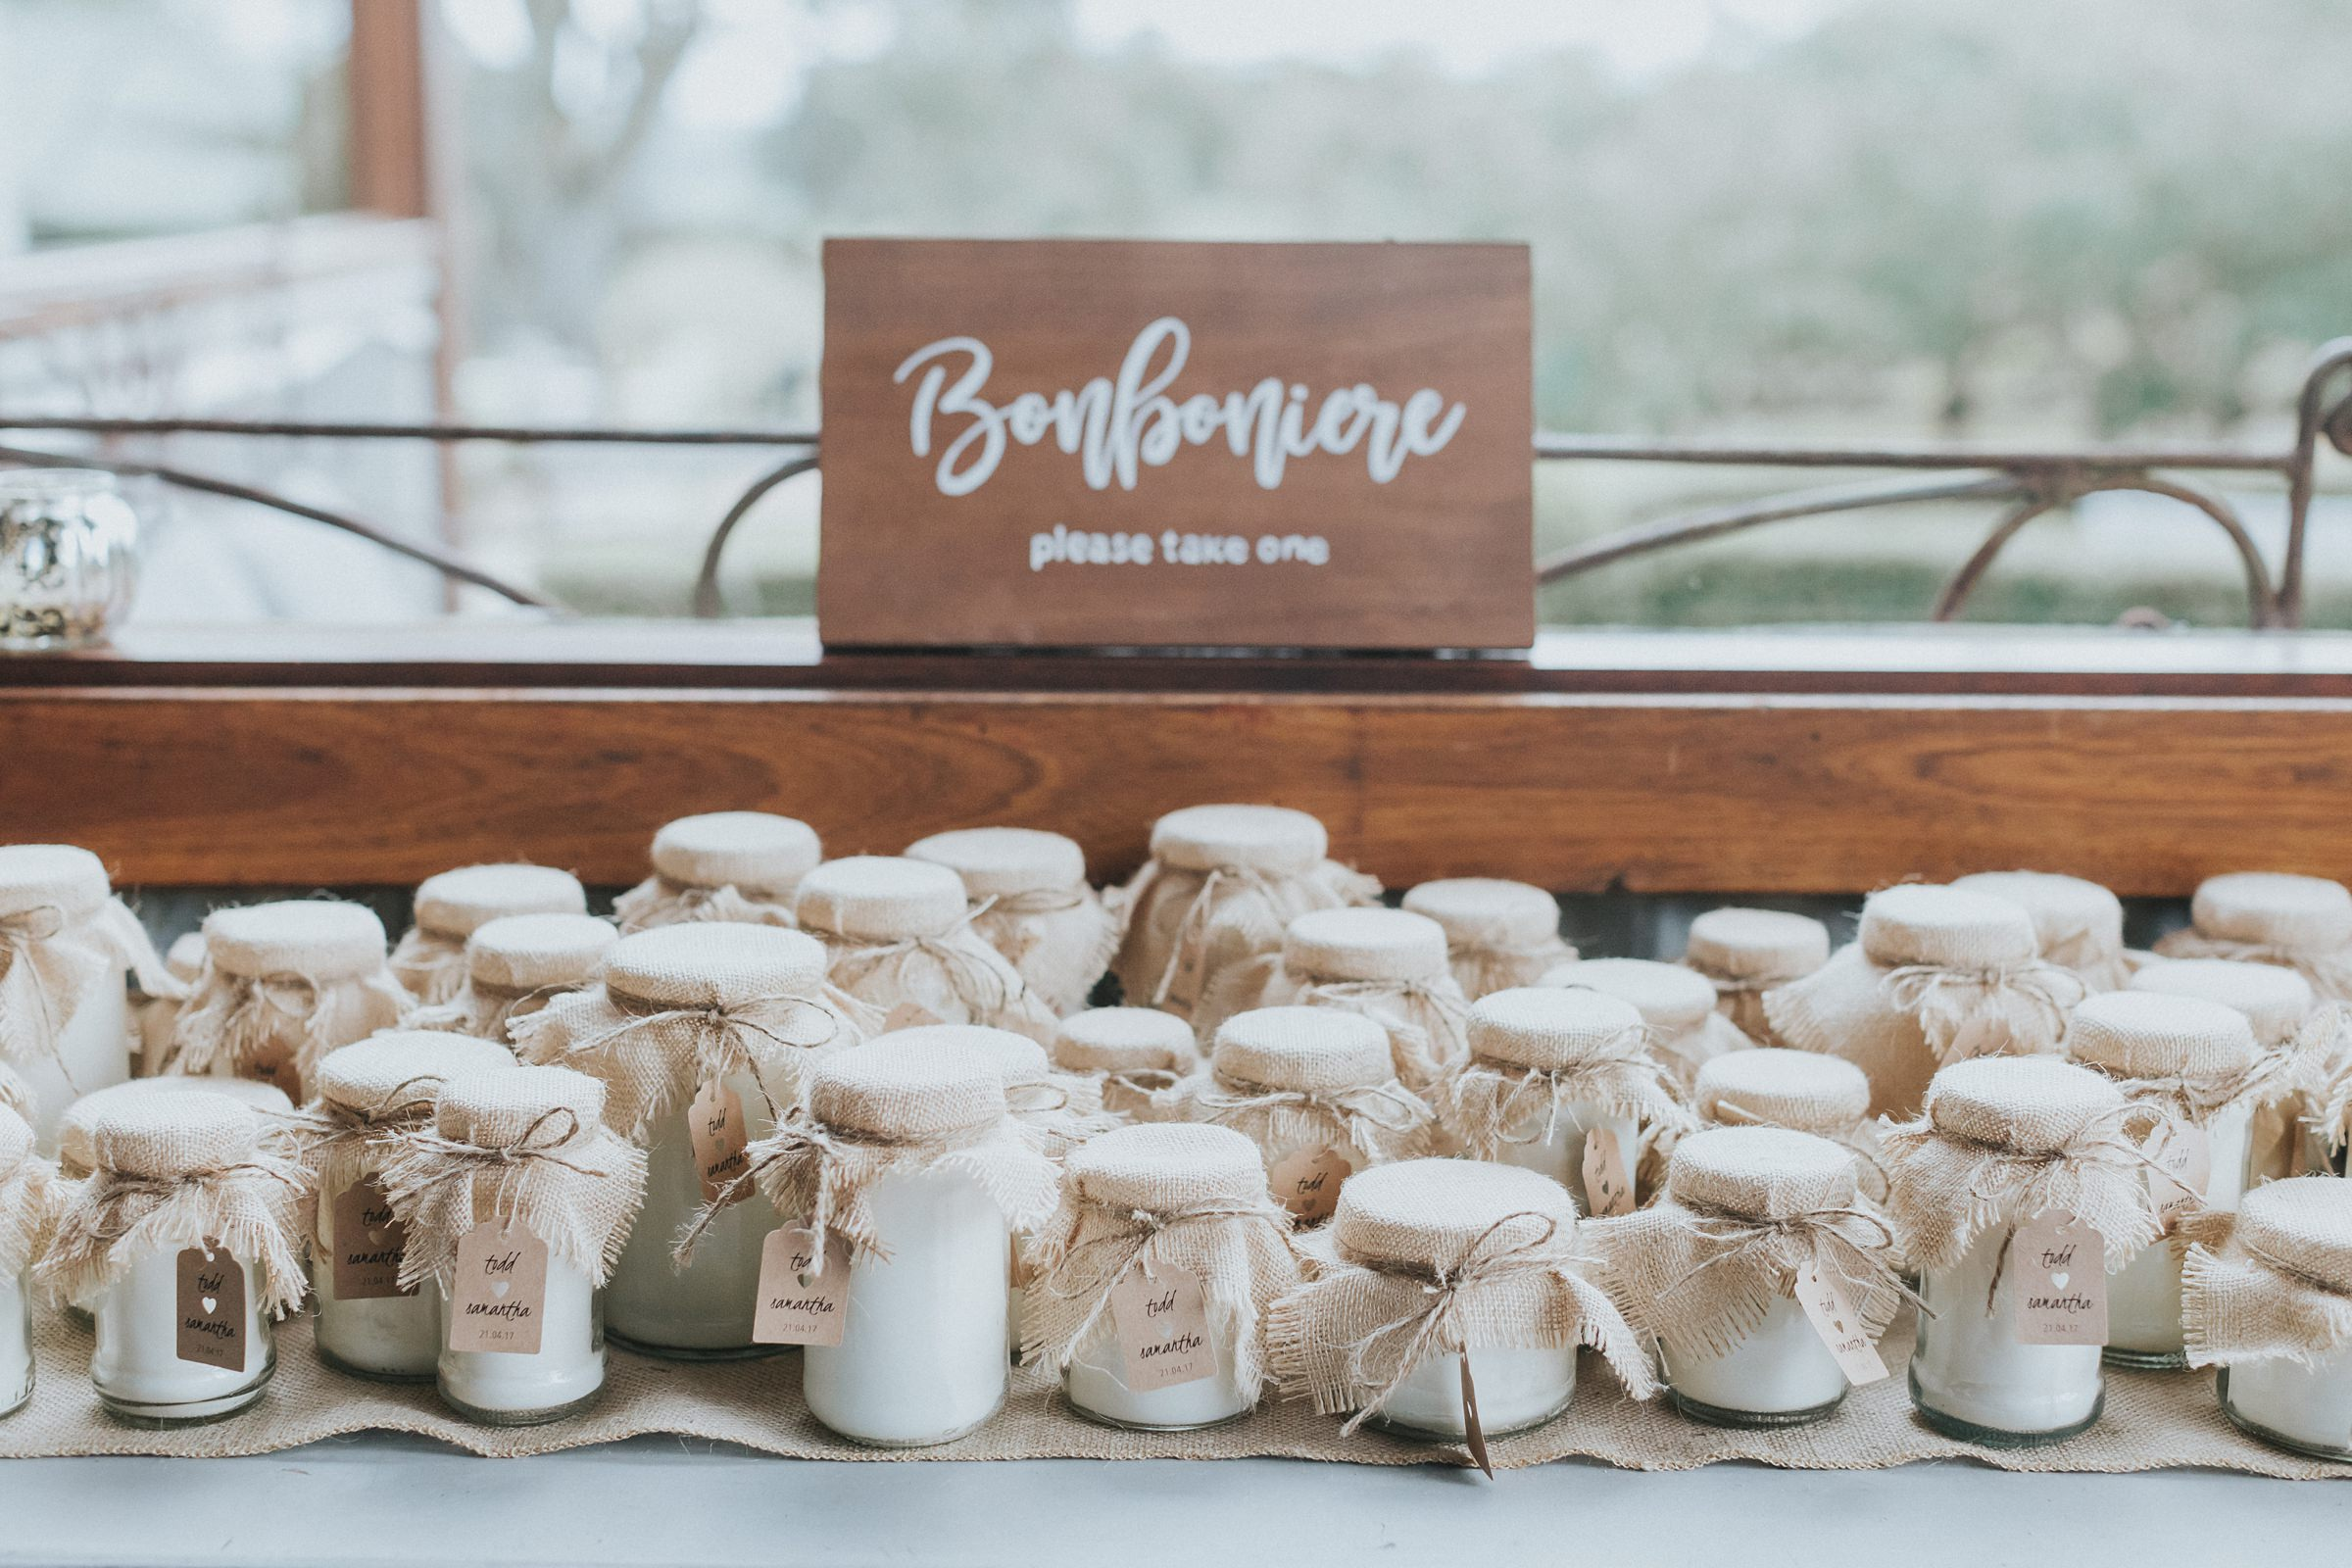 bonboniere at mali brae farm wedding handmade by bride and groom